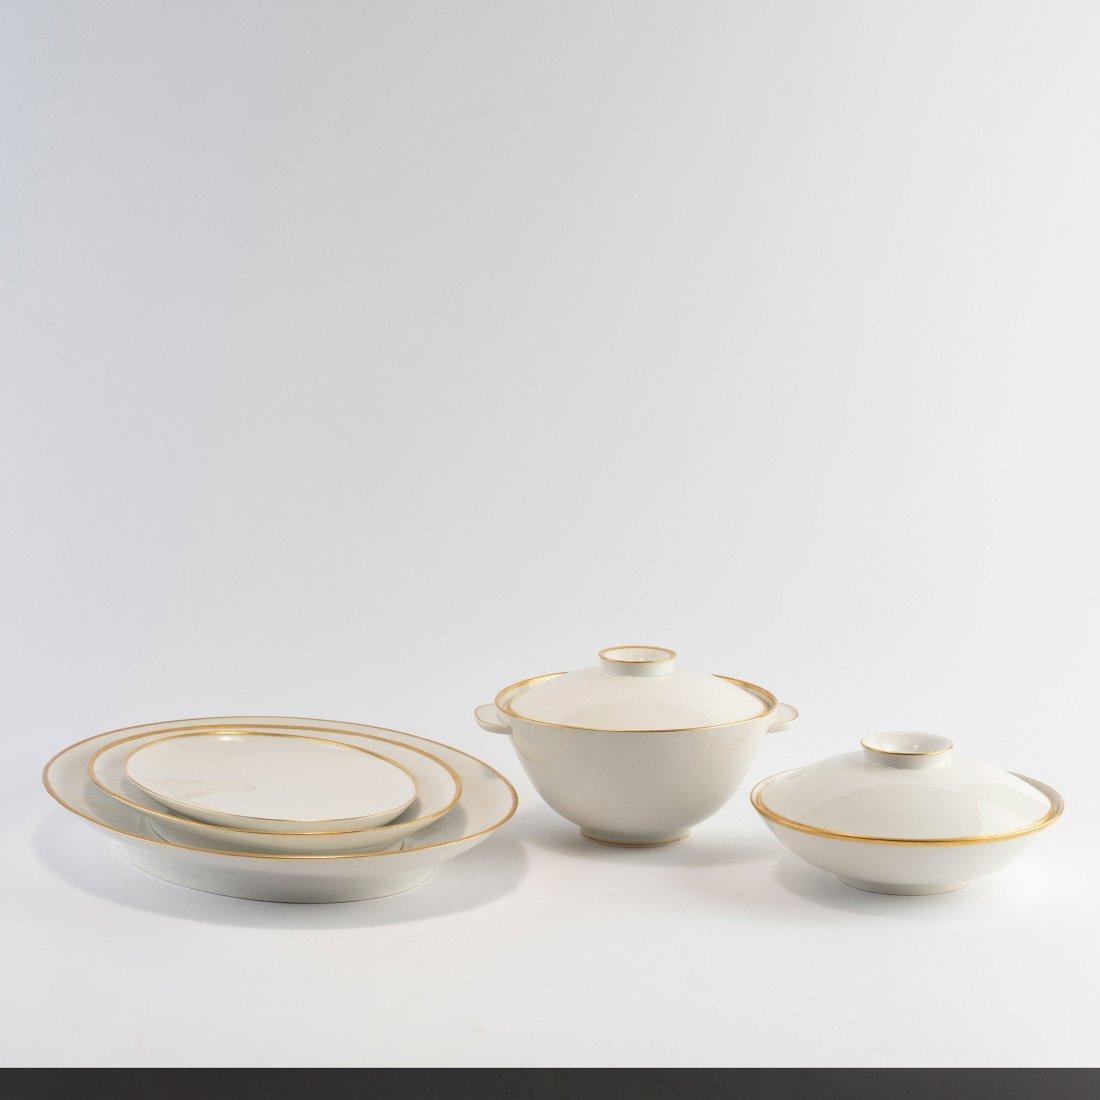 'Urbino' dining set, 1931 - 2